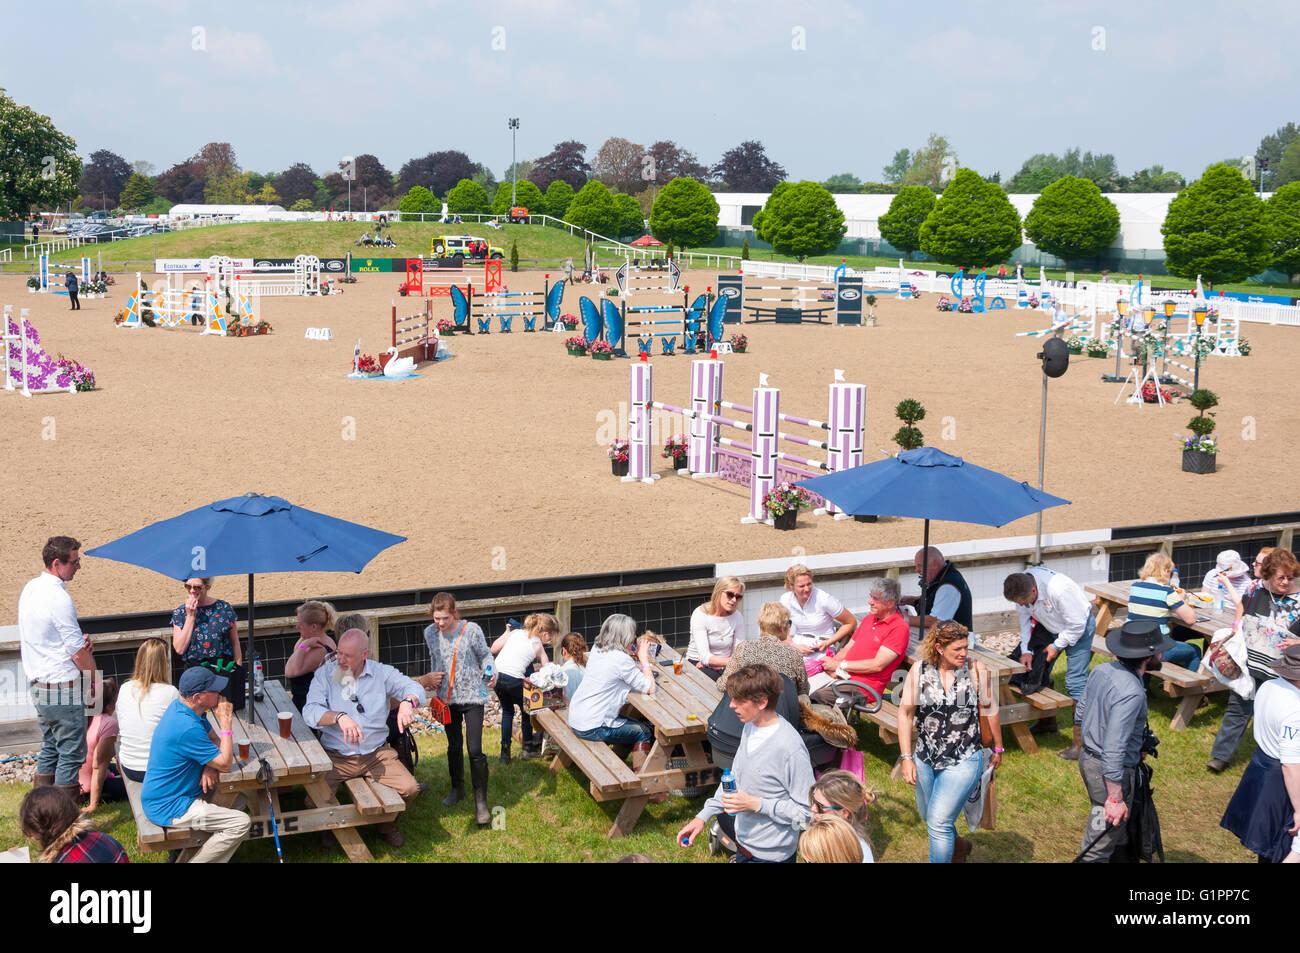 Frogmore Show Jumping Arena at Royal Windsor Horse Show, Home Park, Windsor, Berkshire, England, United Kingdom - Stock Image